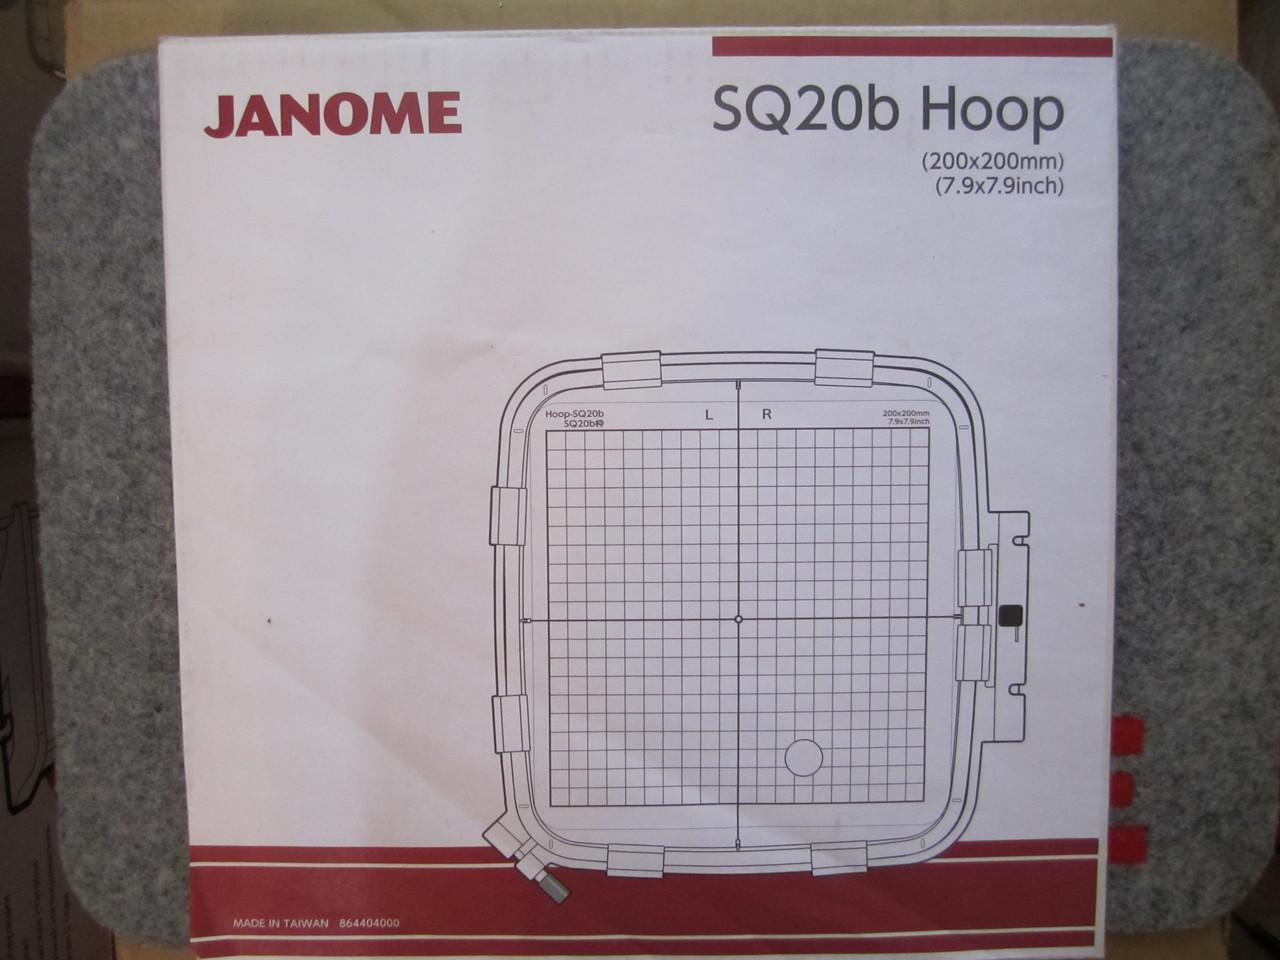 Пяльцы SQ20b HOOP 200х200 для вышивальных машин Janome MC450 E , MC 500 Е    Elna Janome